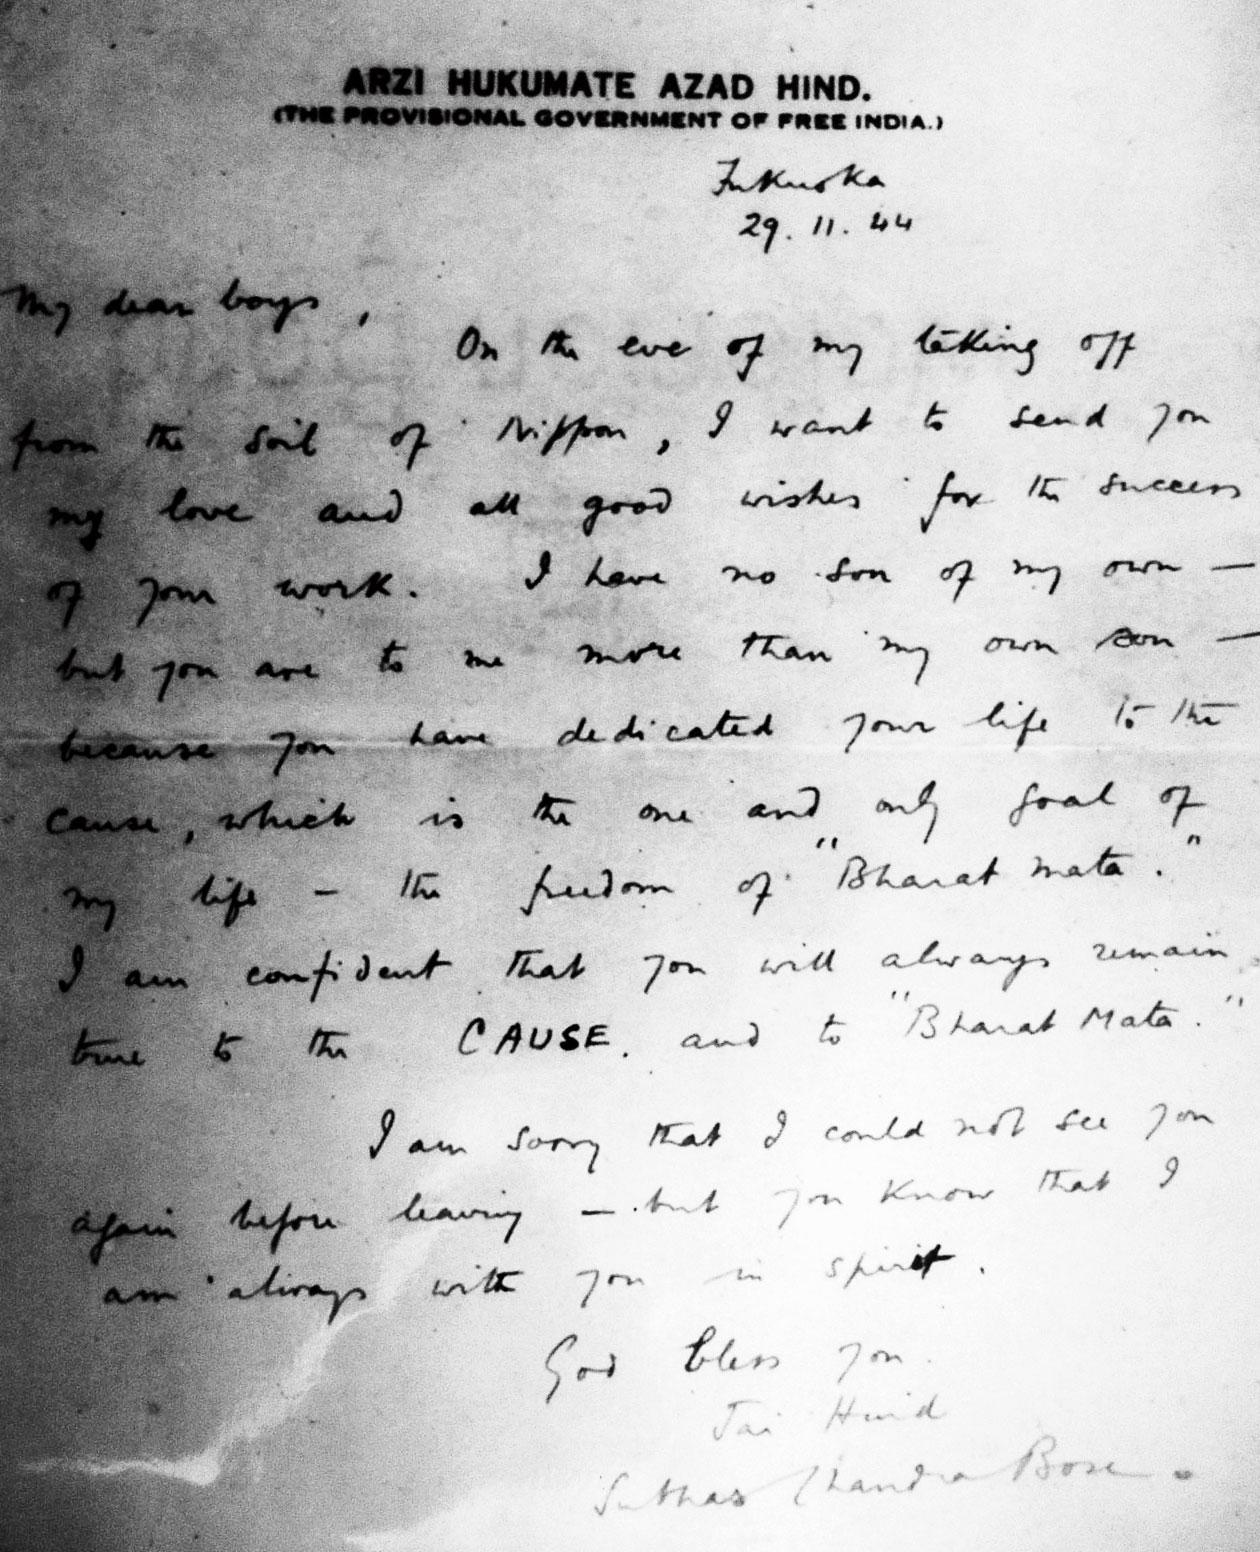 A letter written by Netaji Subhas Chandra Bose